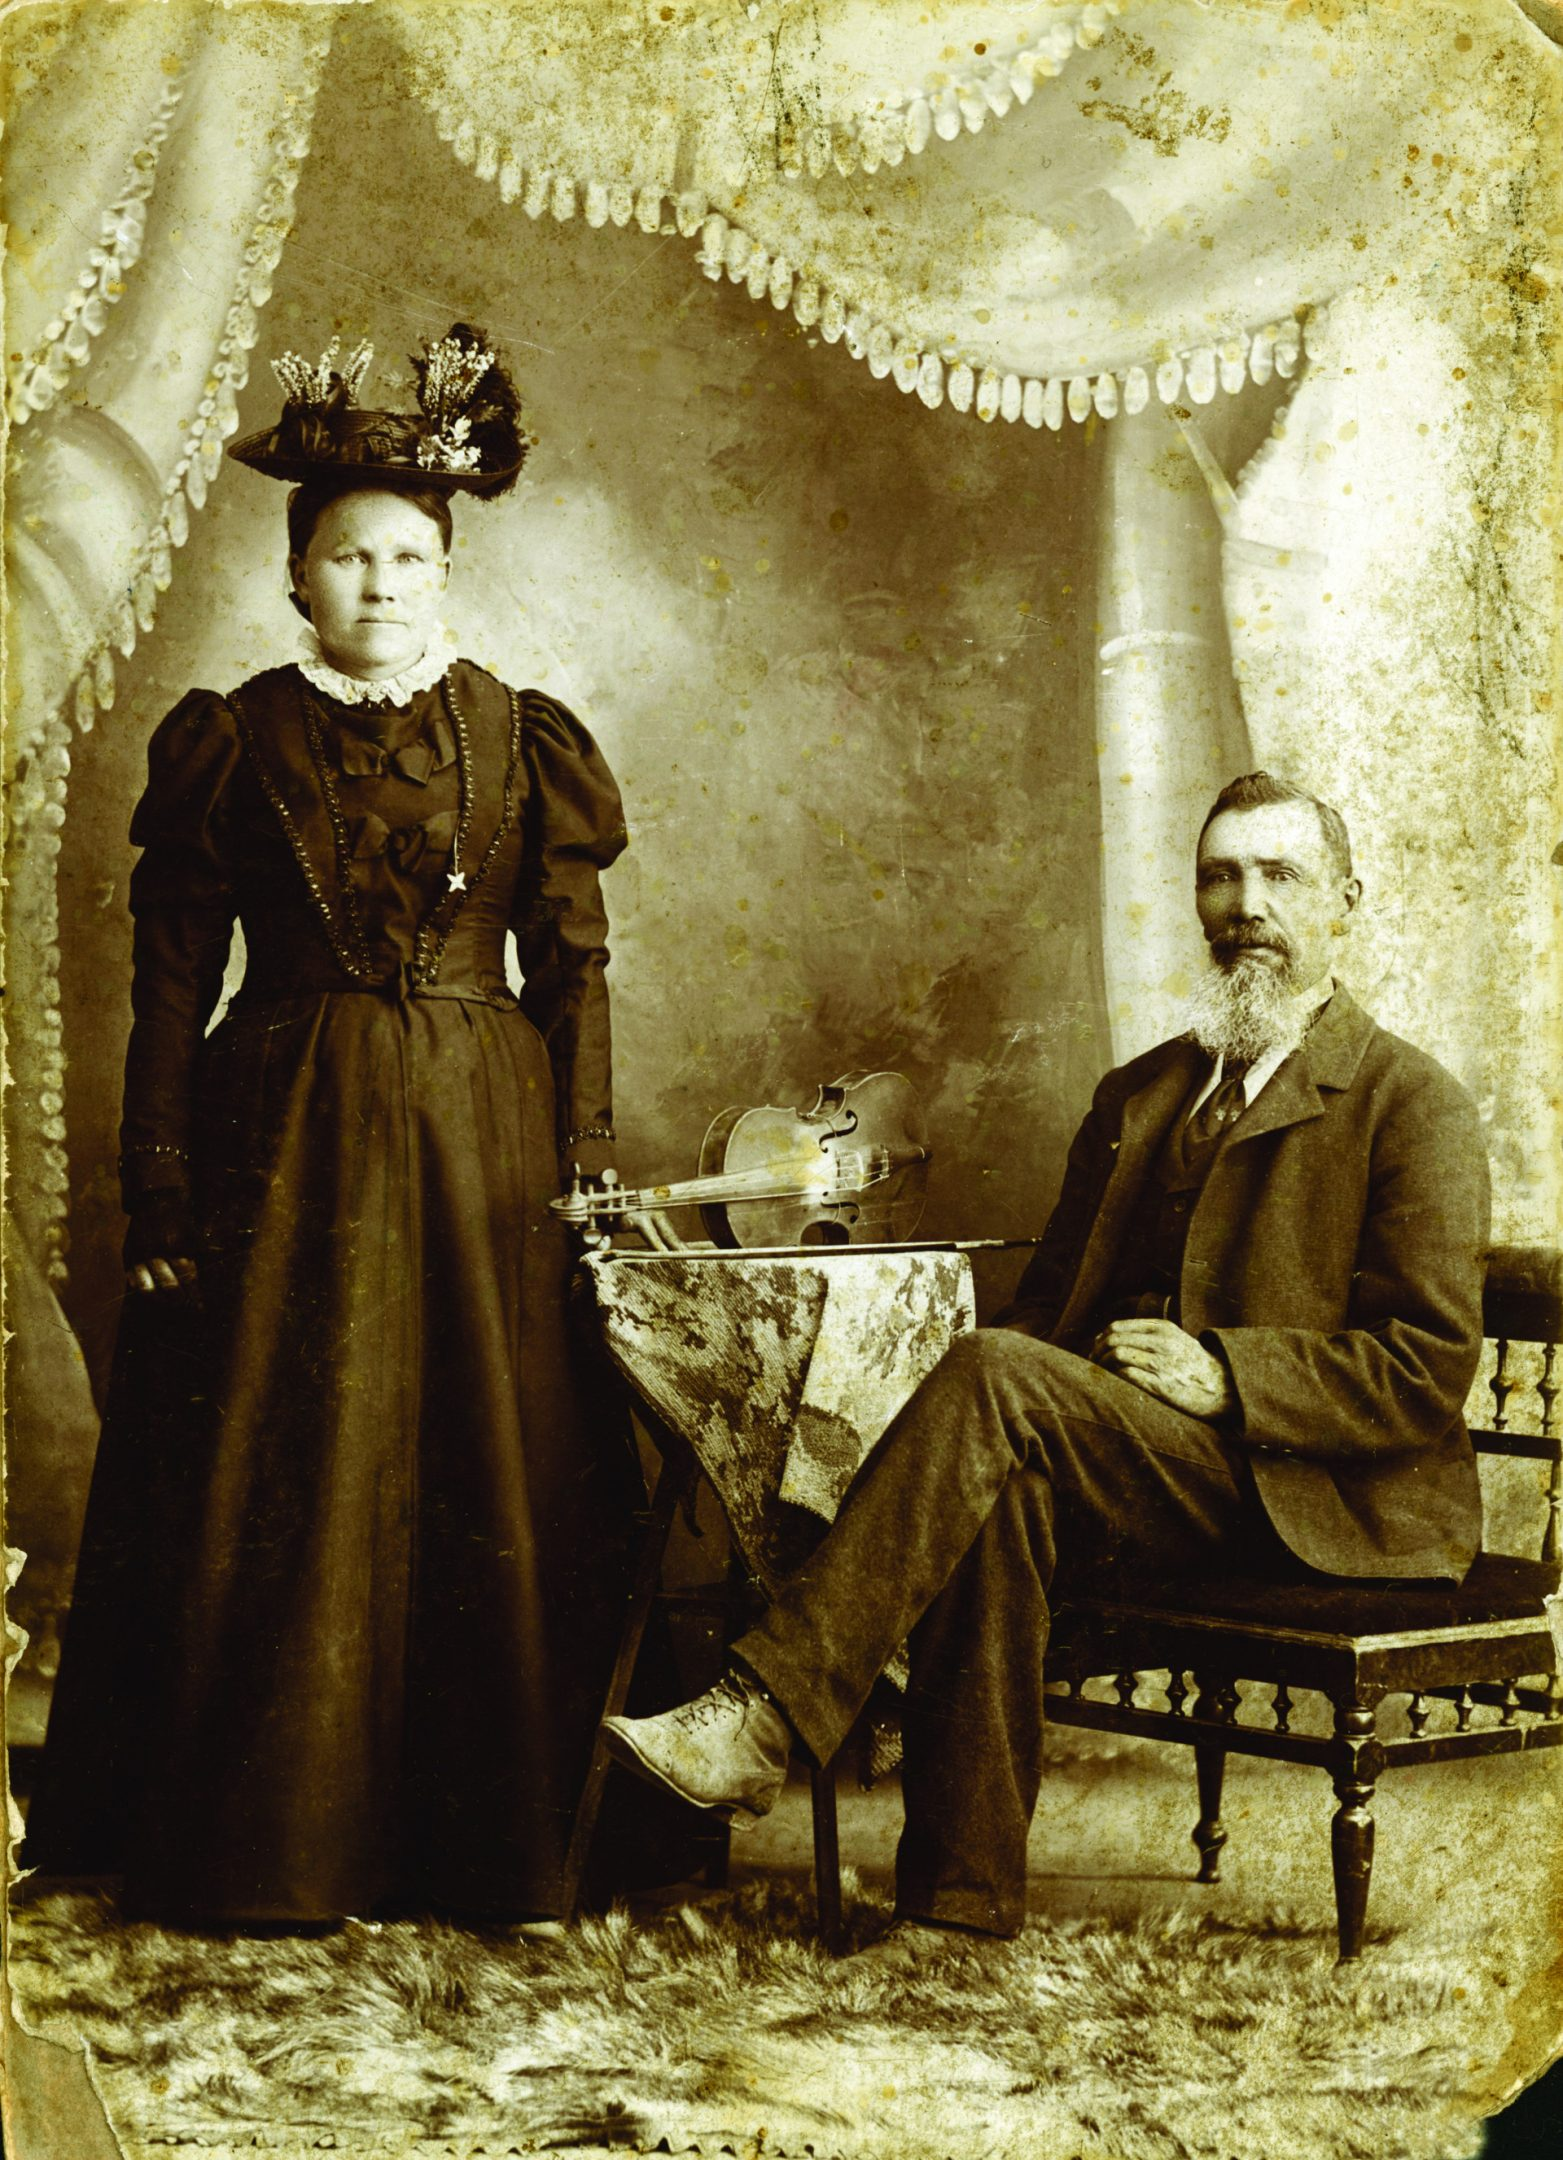 David Garneau's great-great grandparents